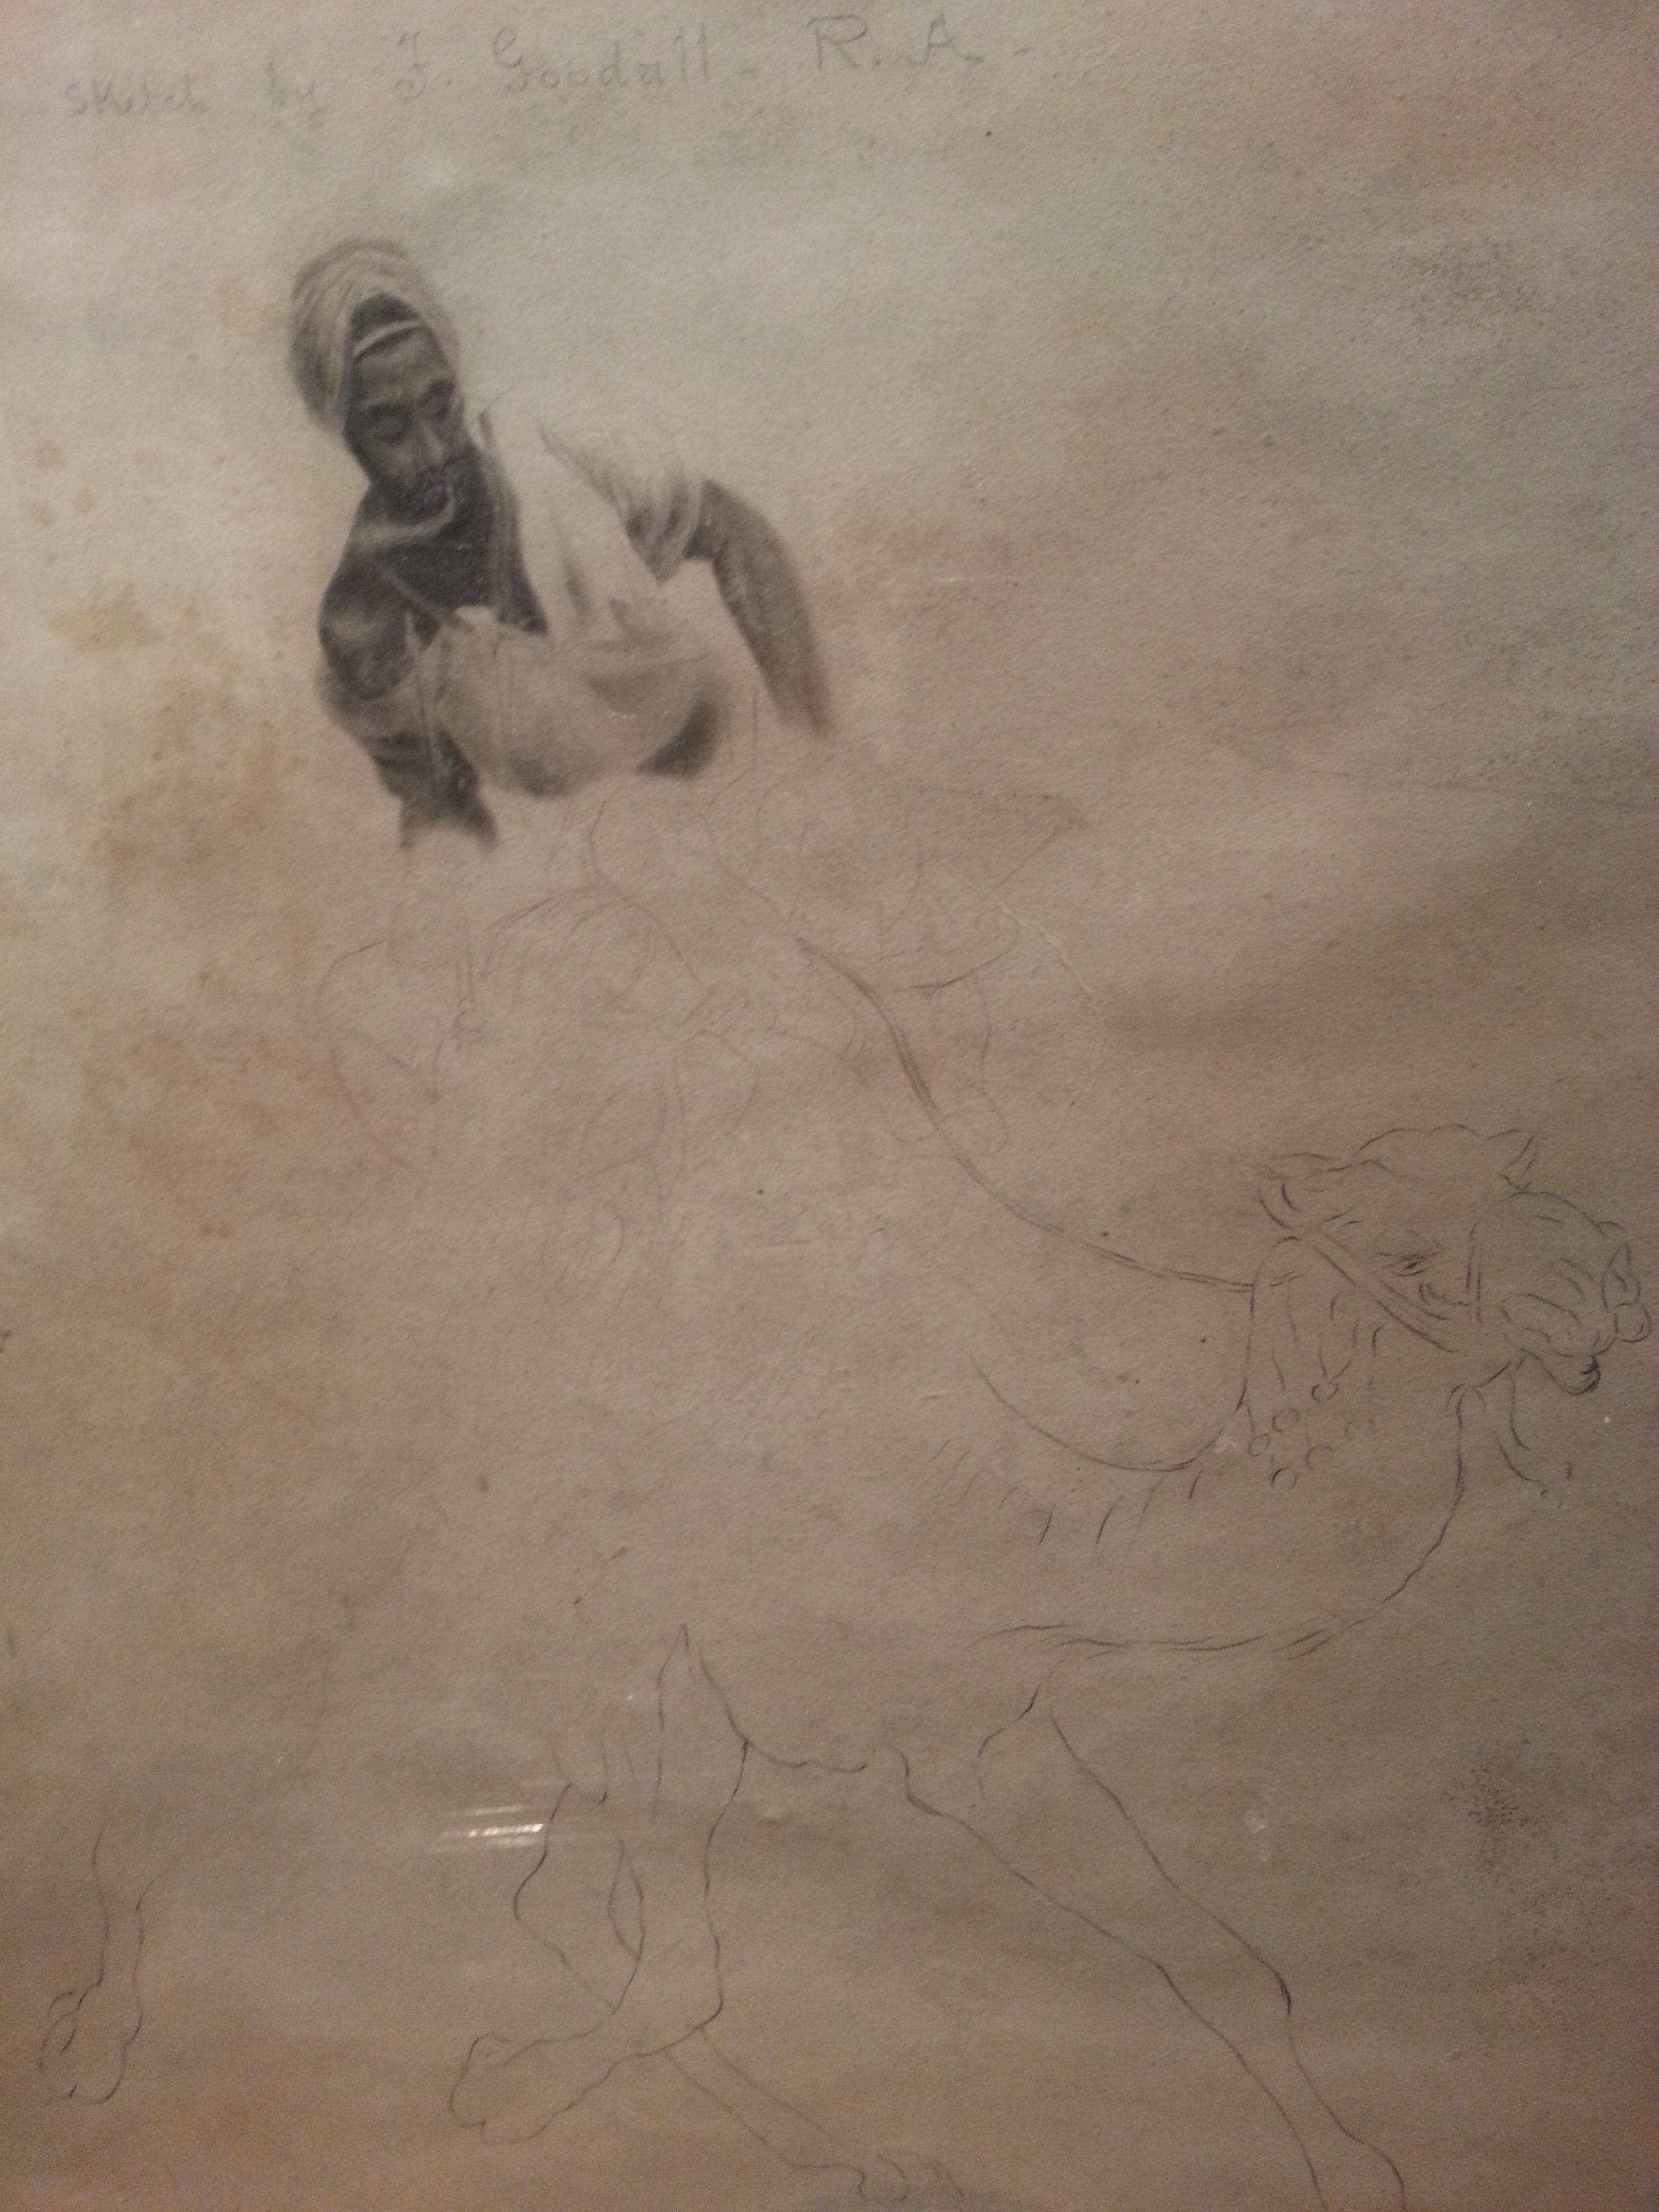 "Frederick Goodall, R.A (British, 1822-1904) Graphite Sketch by Goodall ""Arab Scout"" Mes.: 47,5 x 38 cm."